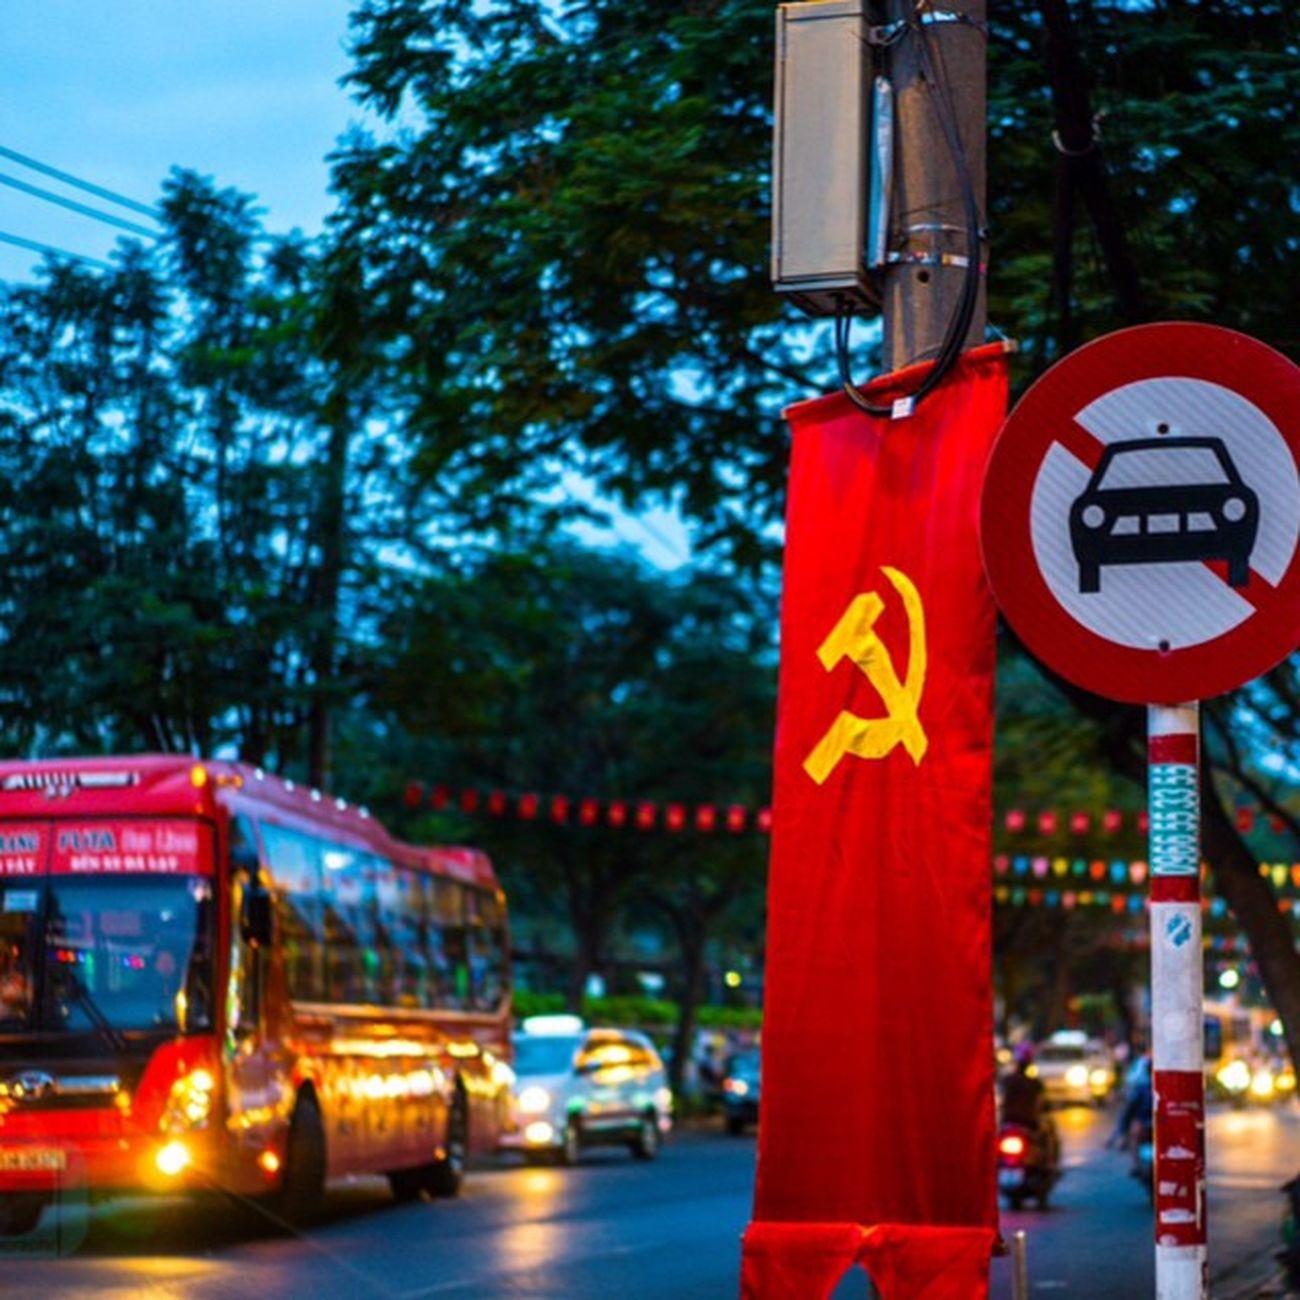 The street of vietnam Sovietflag Vietnam Street Photography Instagood Streetartistry Urbanwalls Wall UrbanART Photooftheday Sprayart ArtWork Graffiti Instagrafite Instagraff Streetphotography Urban Pattern Cities Arts Beautiful